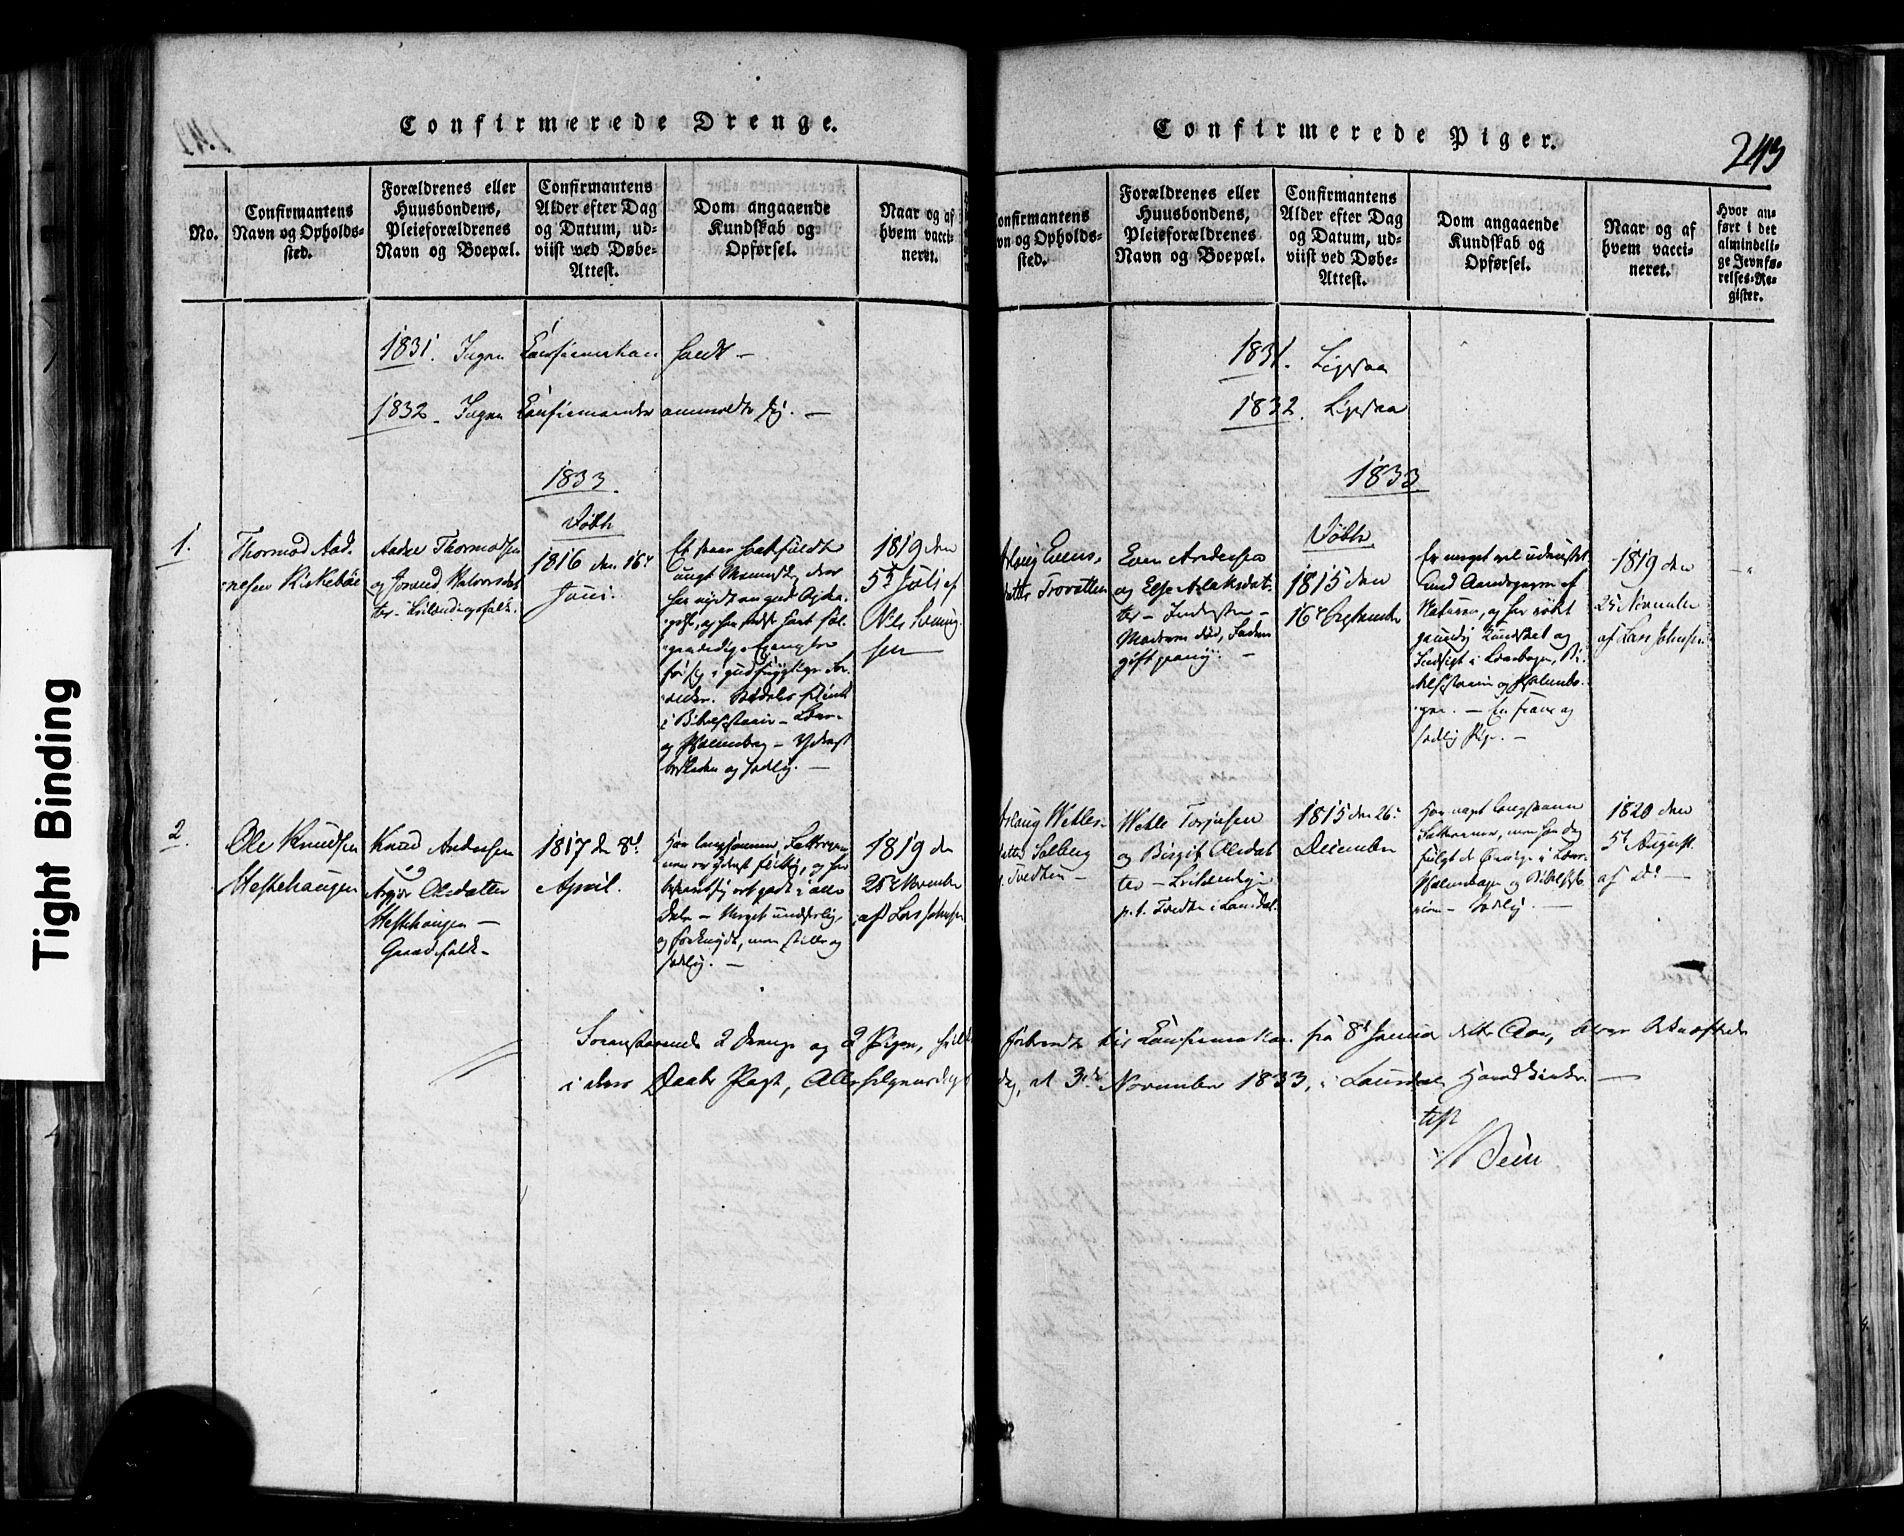 SAKO, Rauland kirkebøker, F/Fa/L0002: Ministerialbok nr. 2, 1815-1860, s. 243